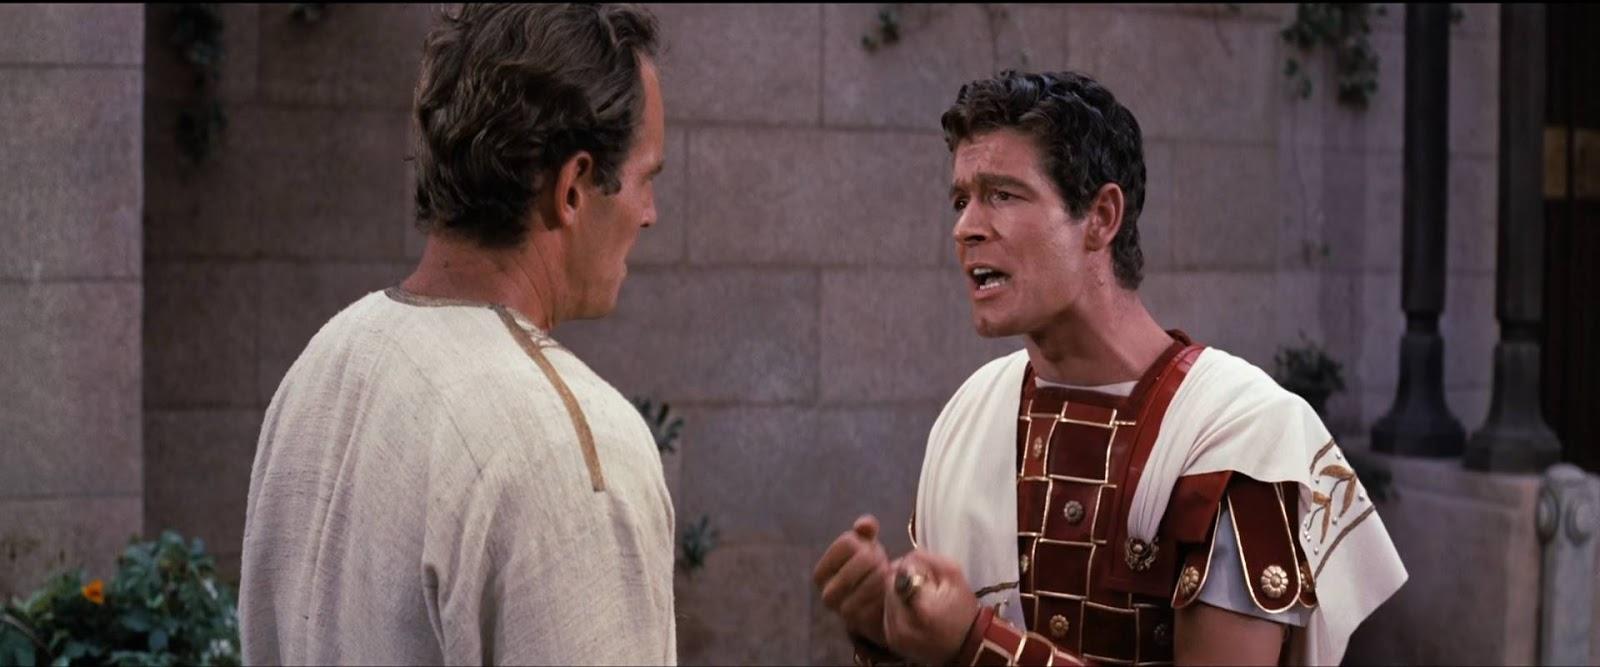 Ben-Hur (1959) 4